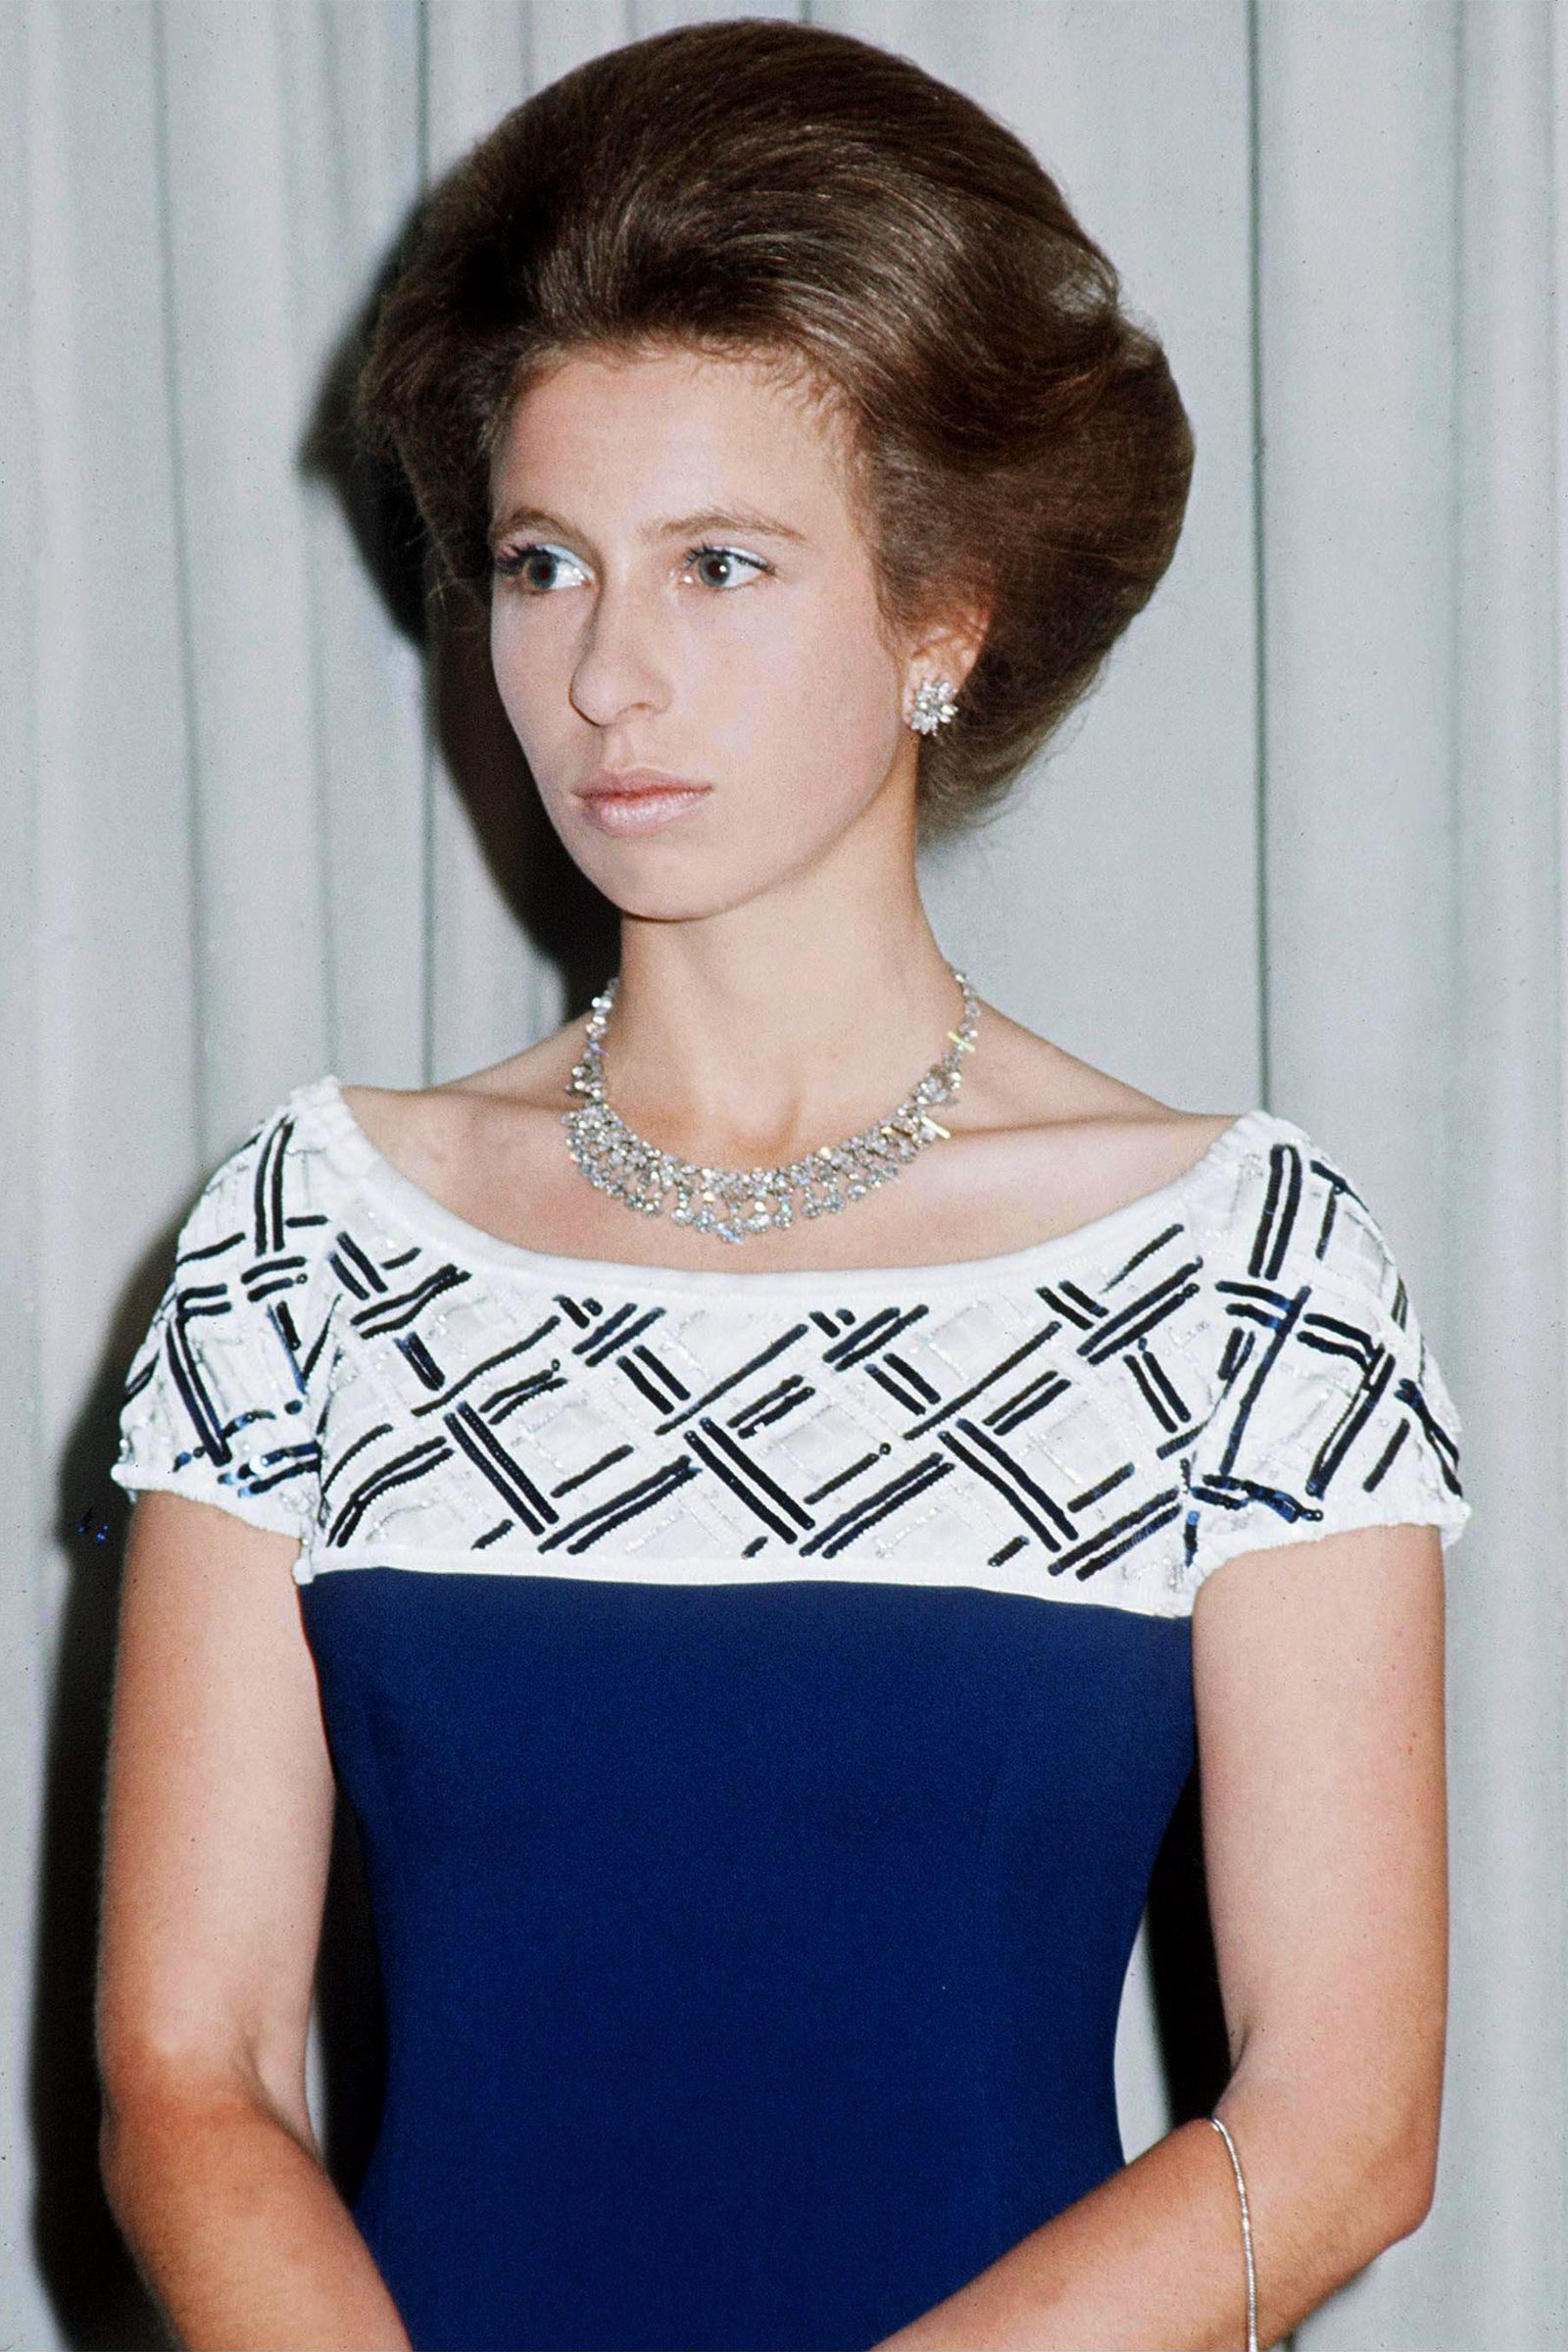 Princess Anne's Stylish Life in Photos em 2020 Princesa